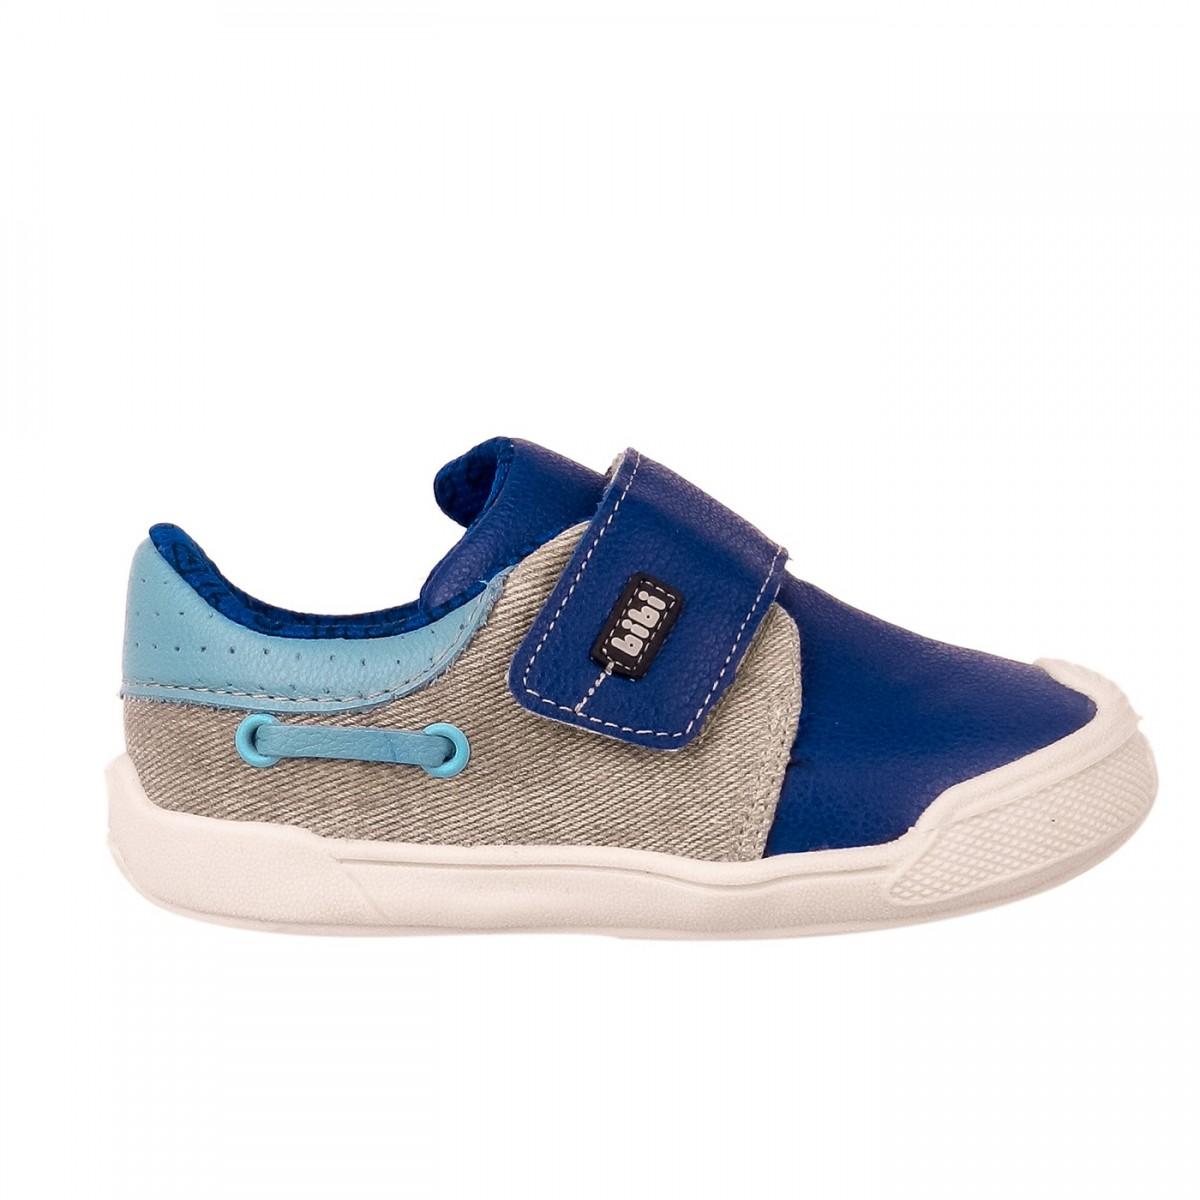 ce59665b481ab Bizz Store - Tênis Infantil Masculino Bibi Crescer New II Azul